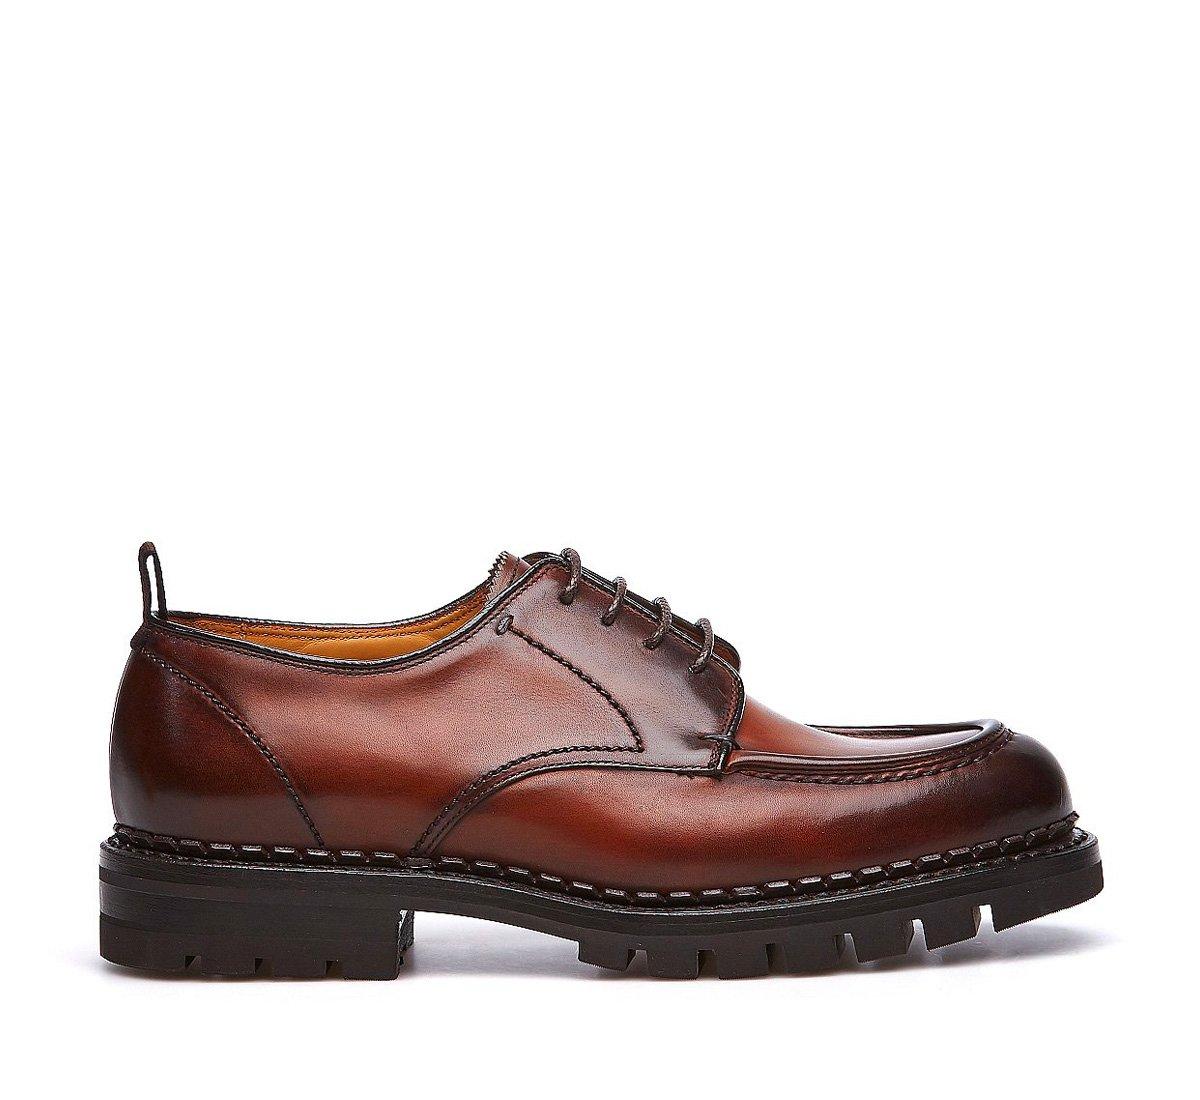 Ботинки на шнурках из телячьей кожи